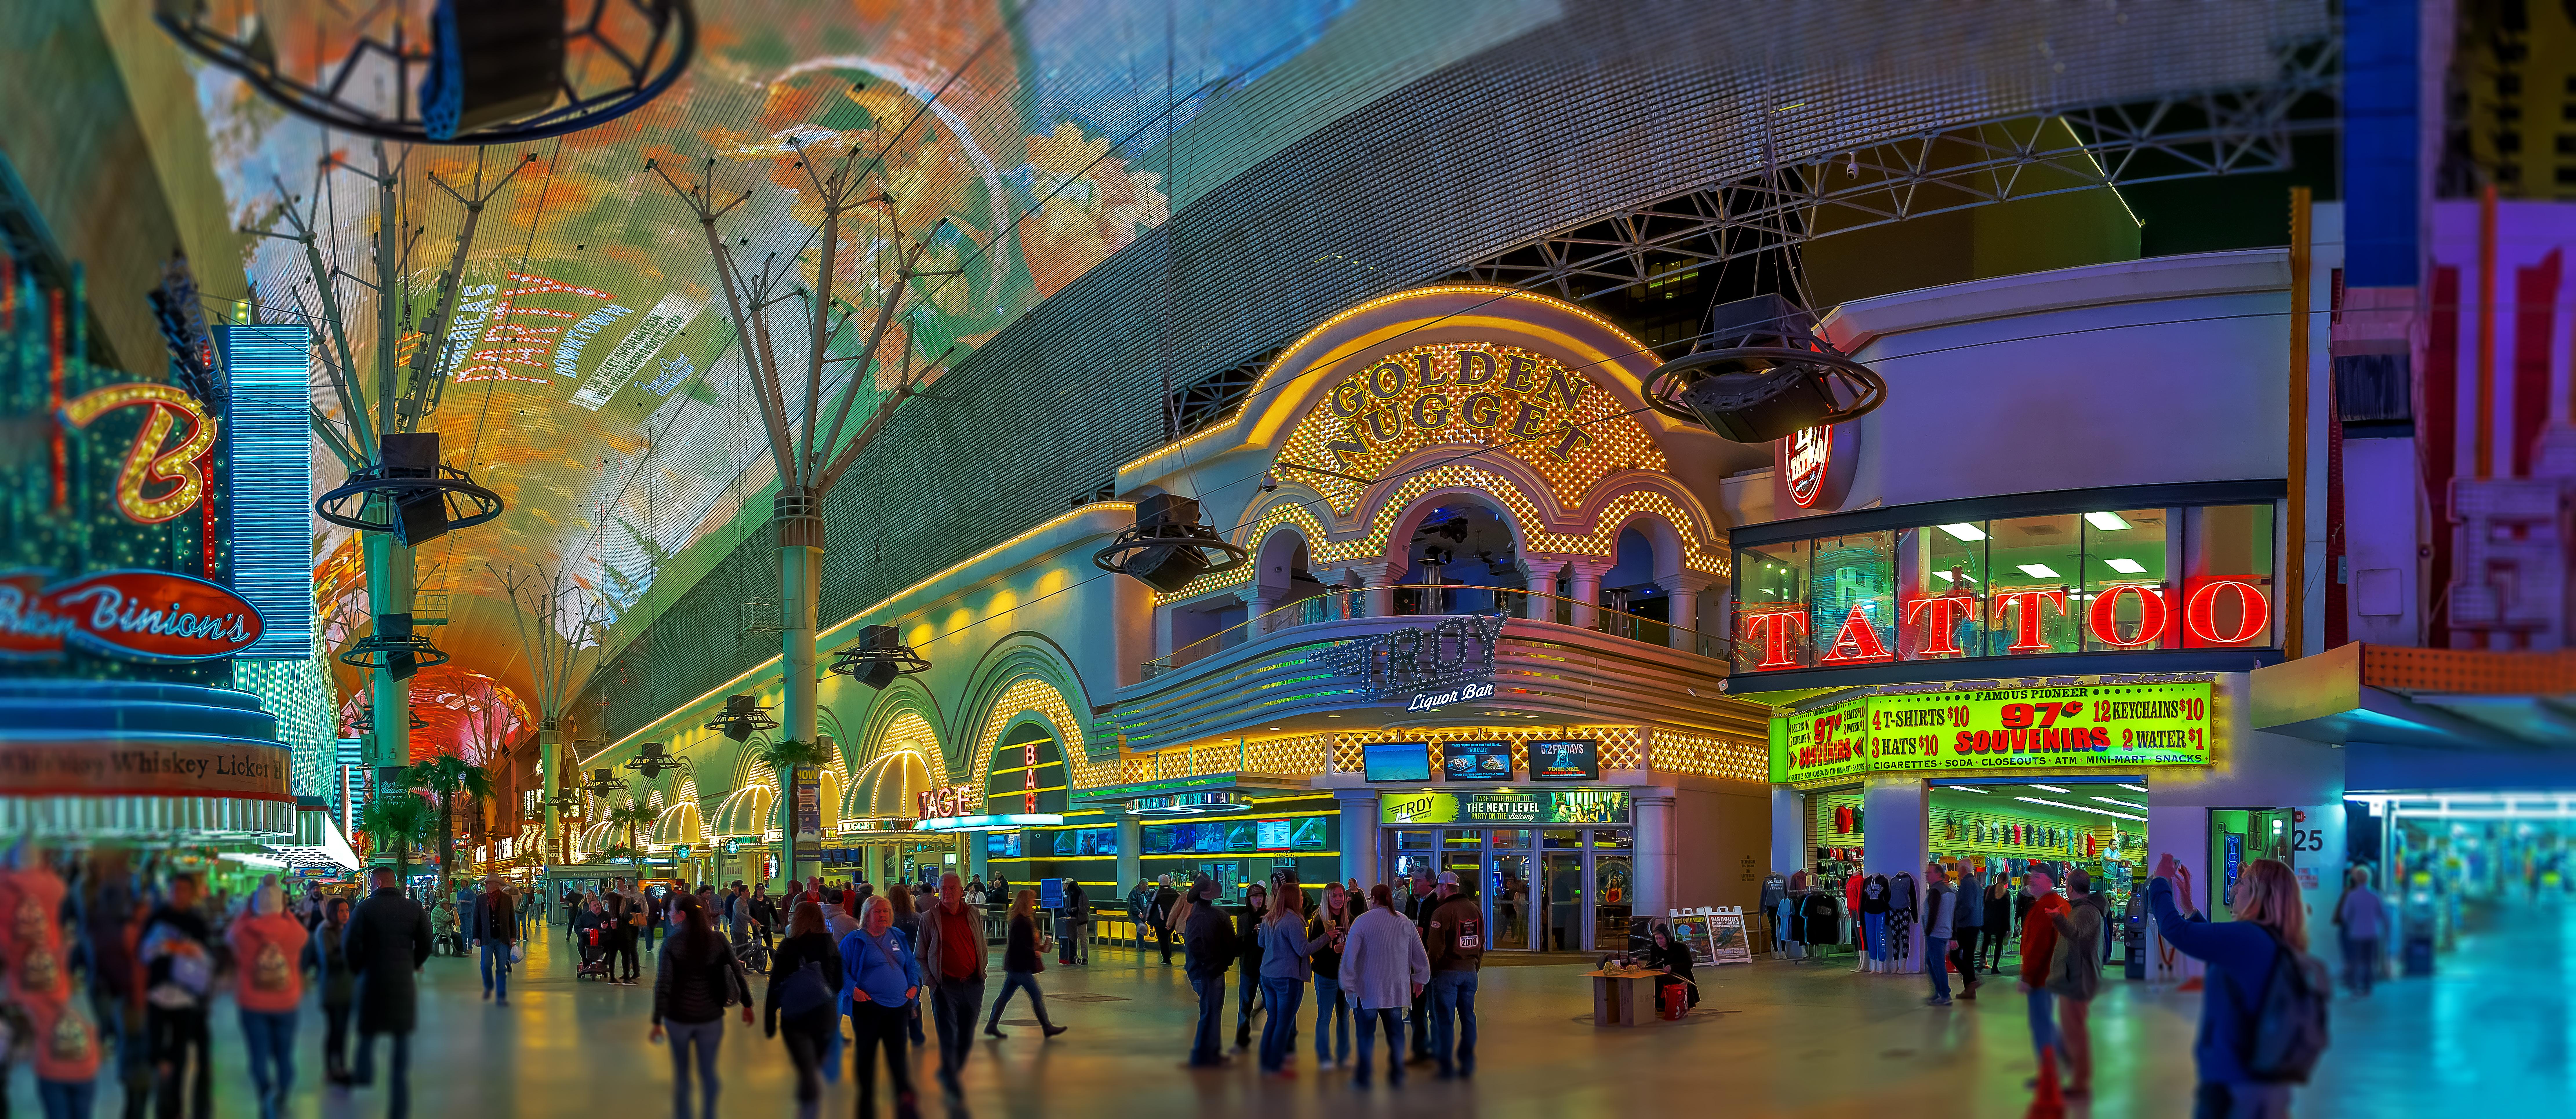 Biggest shopping centre in las vegas